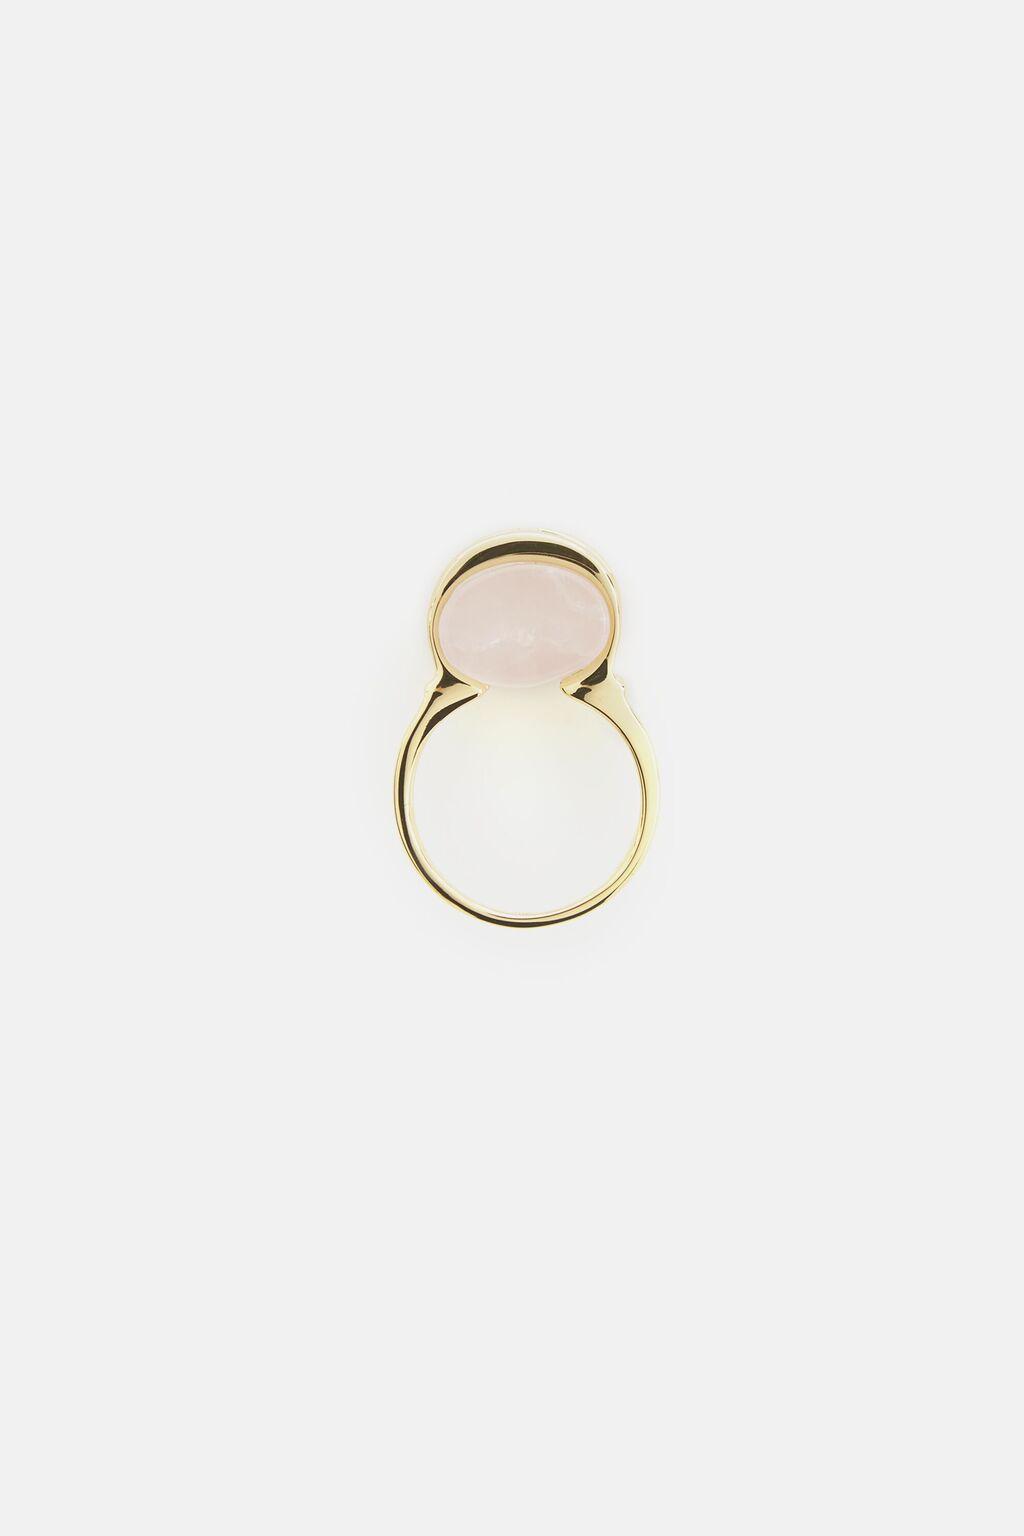 Scala ring